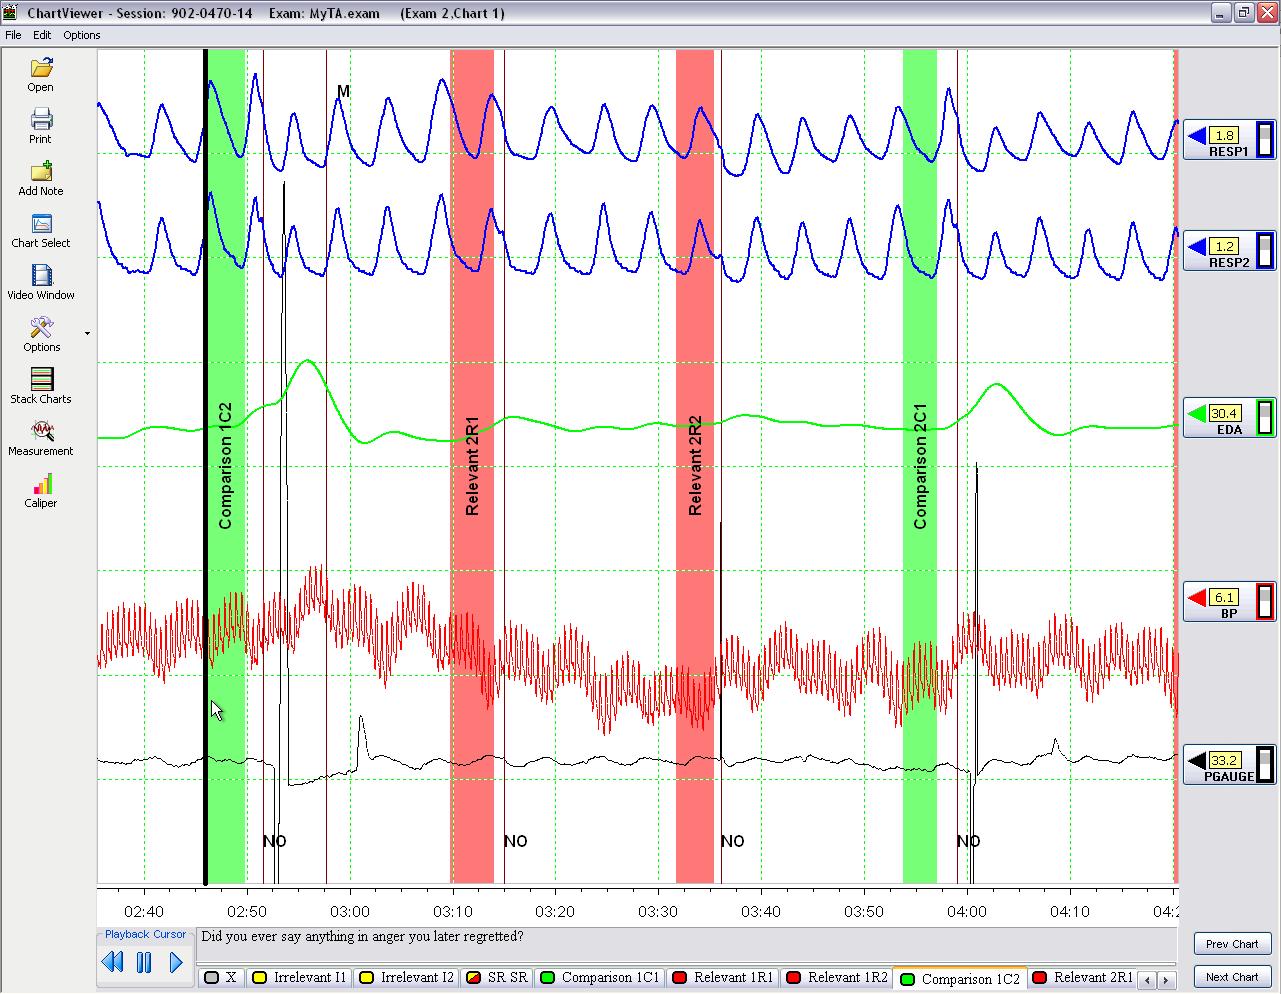 Confirmed Polygraph Countermeasure Case Documentation